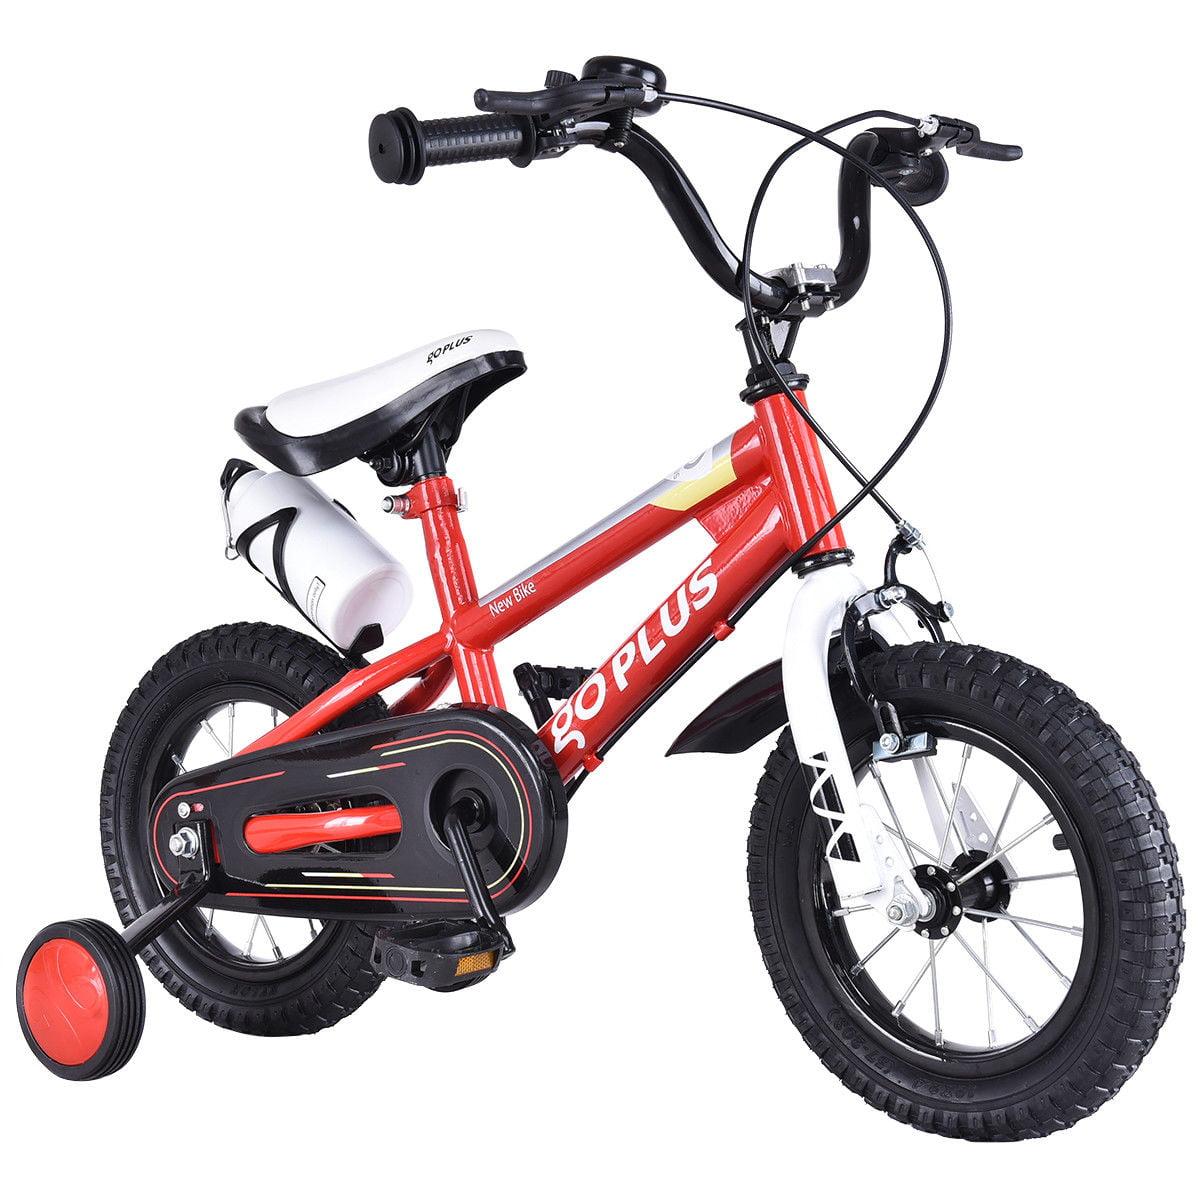 "Goplus 12"" Freestyle Kids Bike Bicycle Children Boys & Girls Gift w Training Wheels... by Goplus"